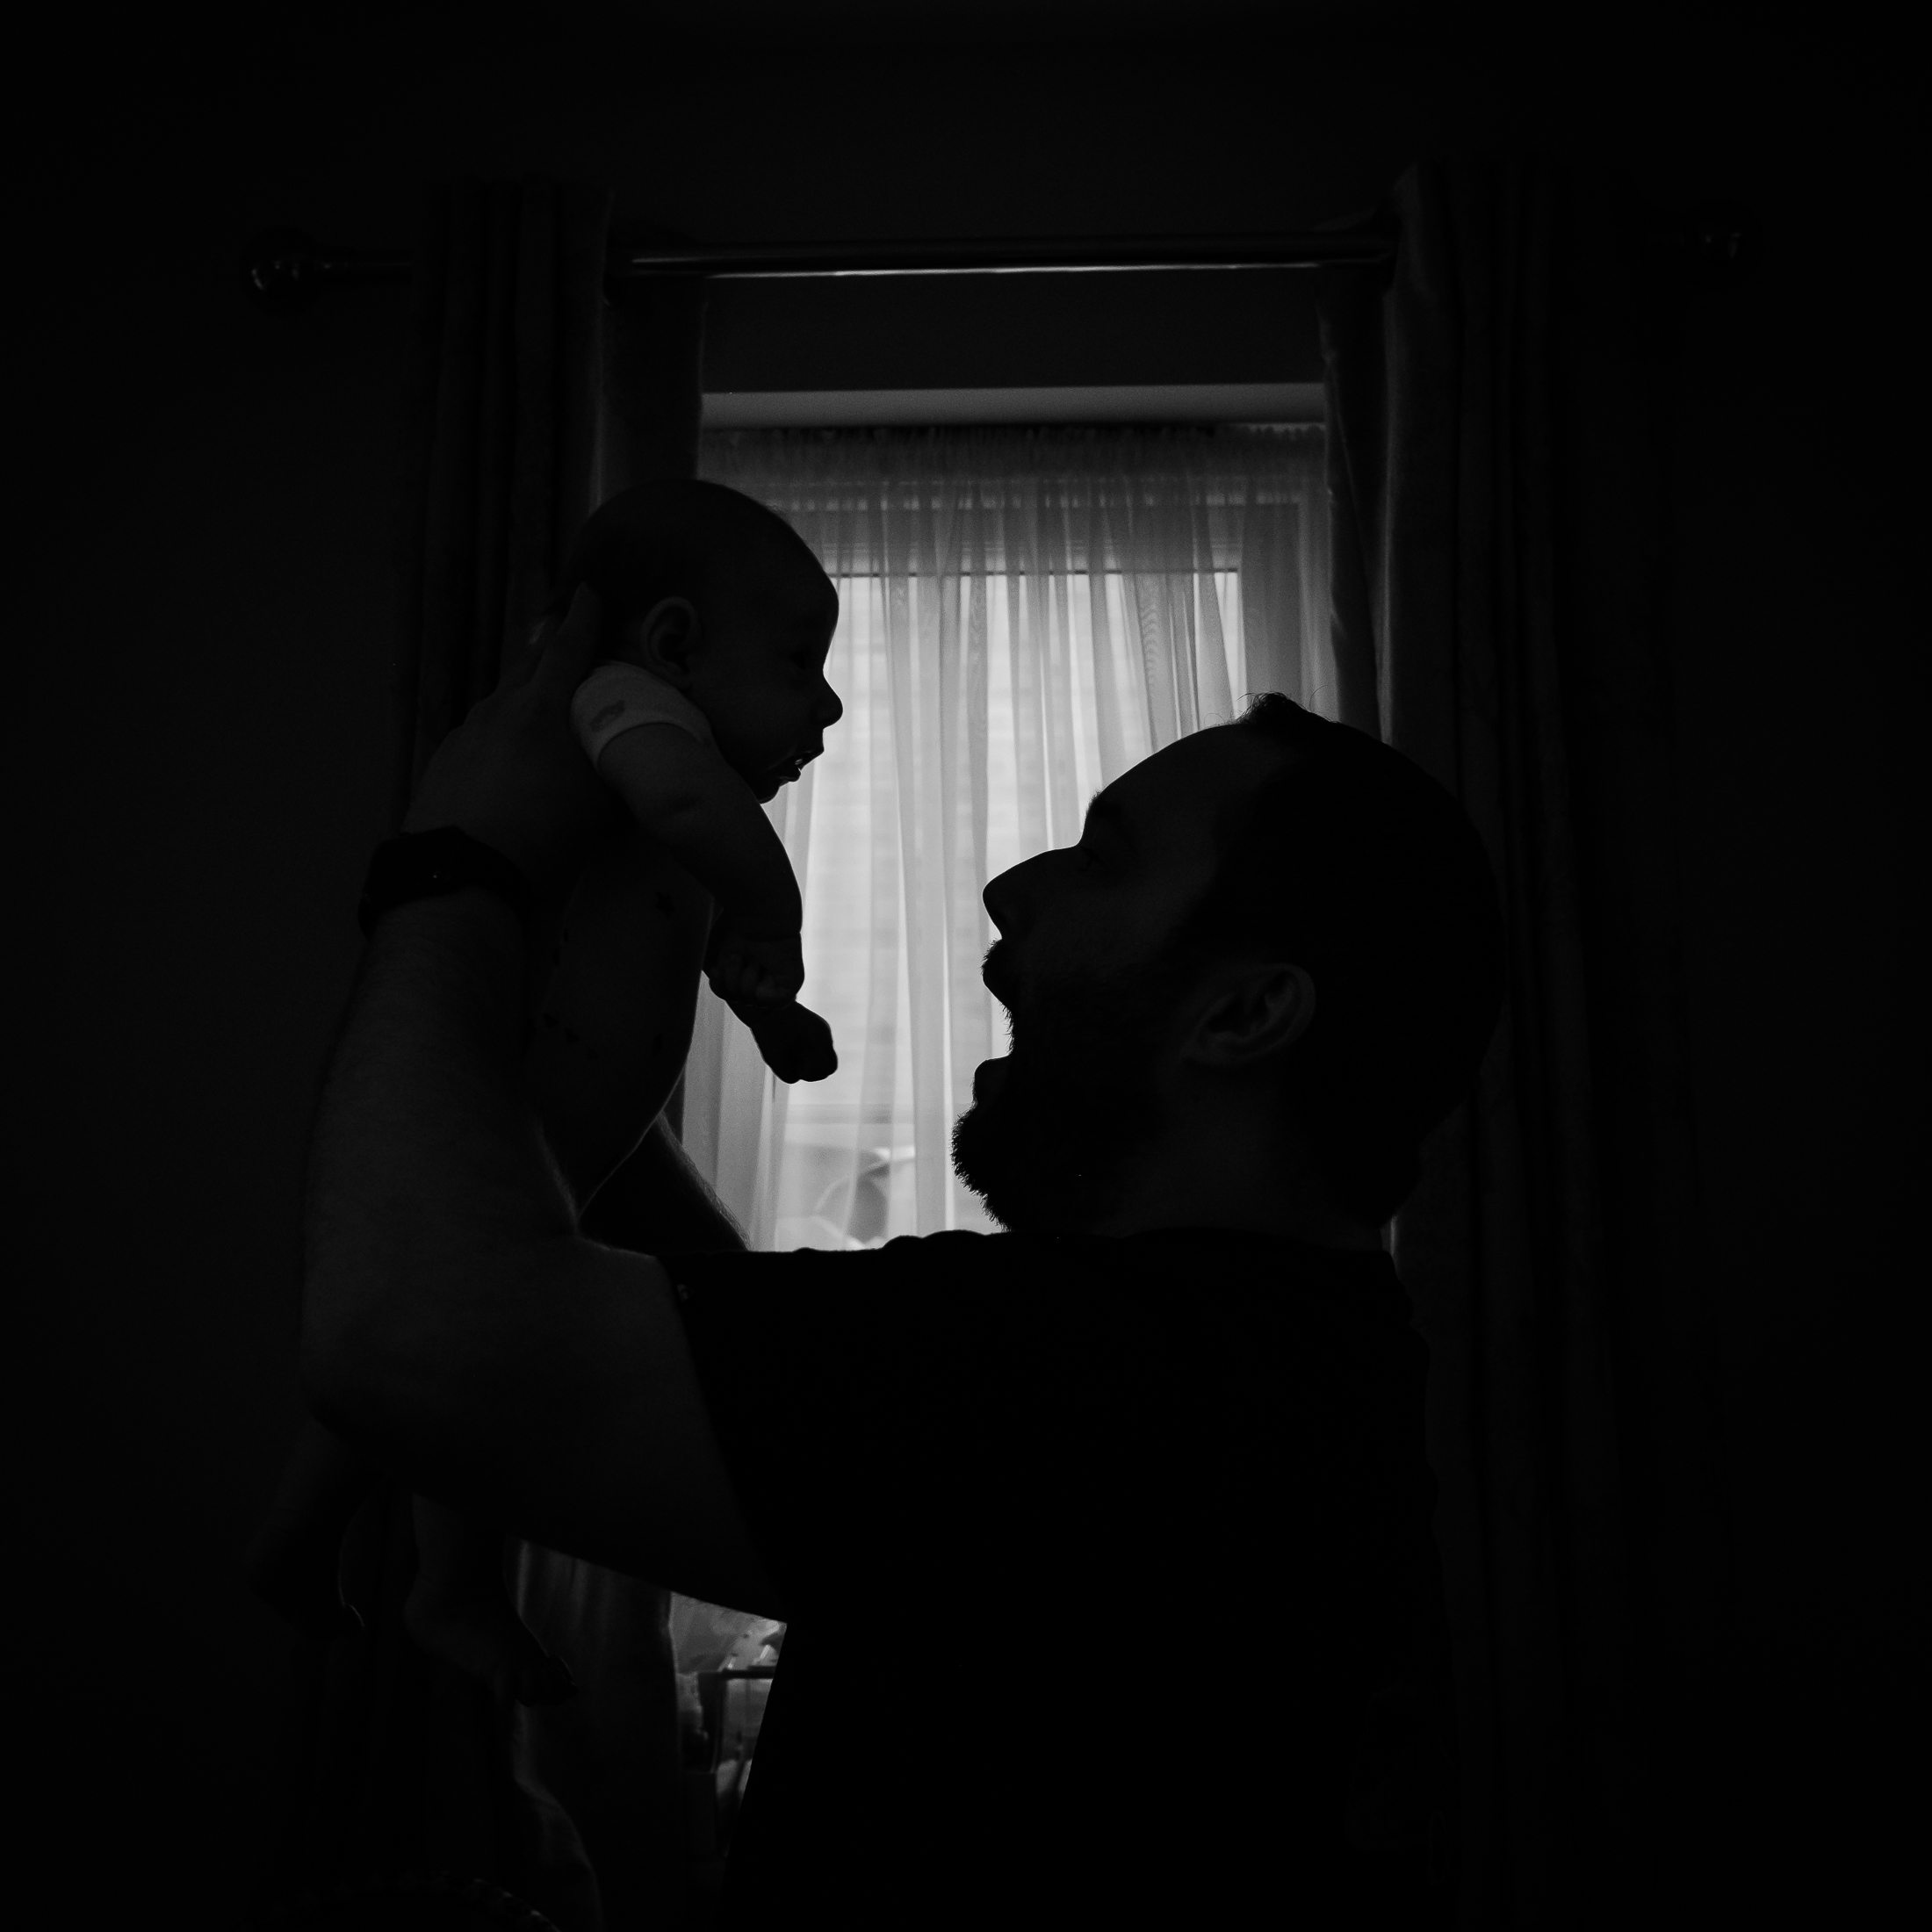 silhouette-dad-son